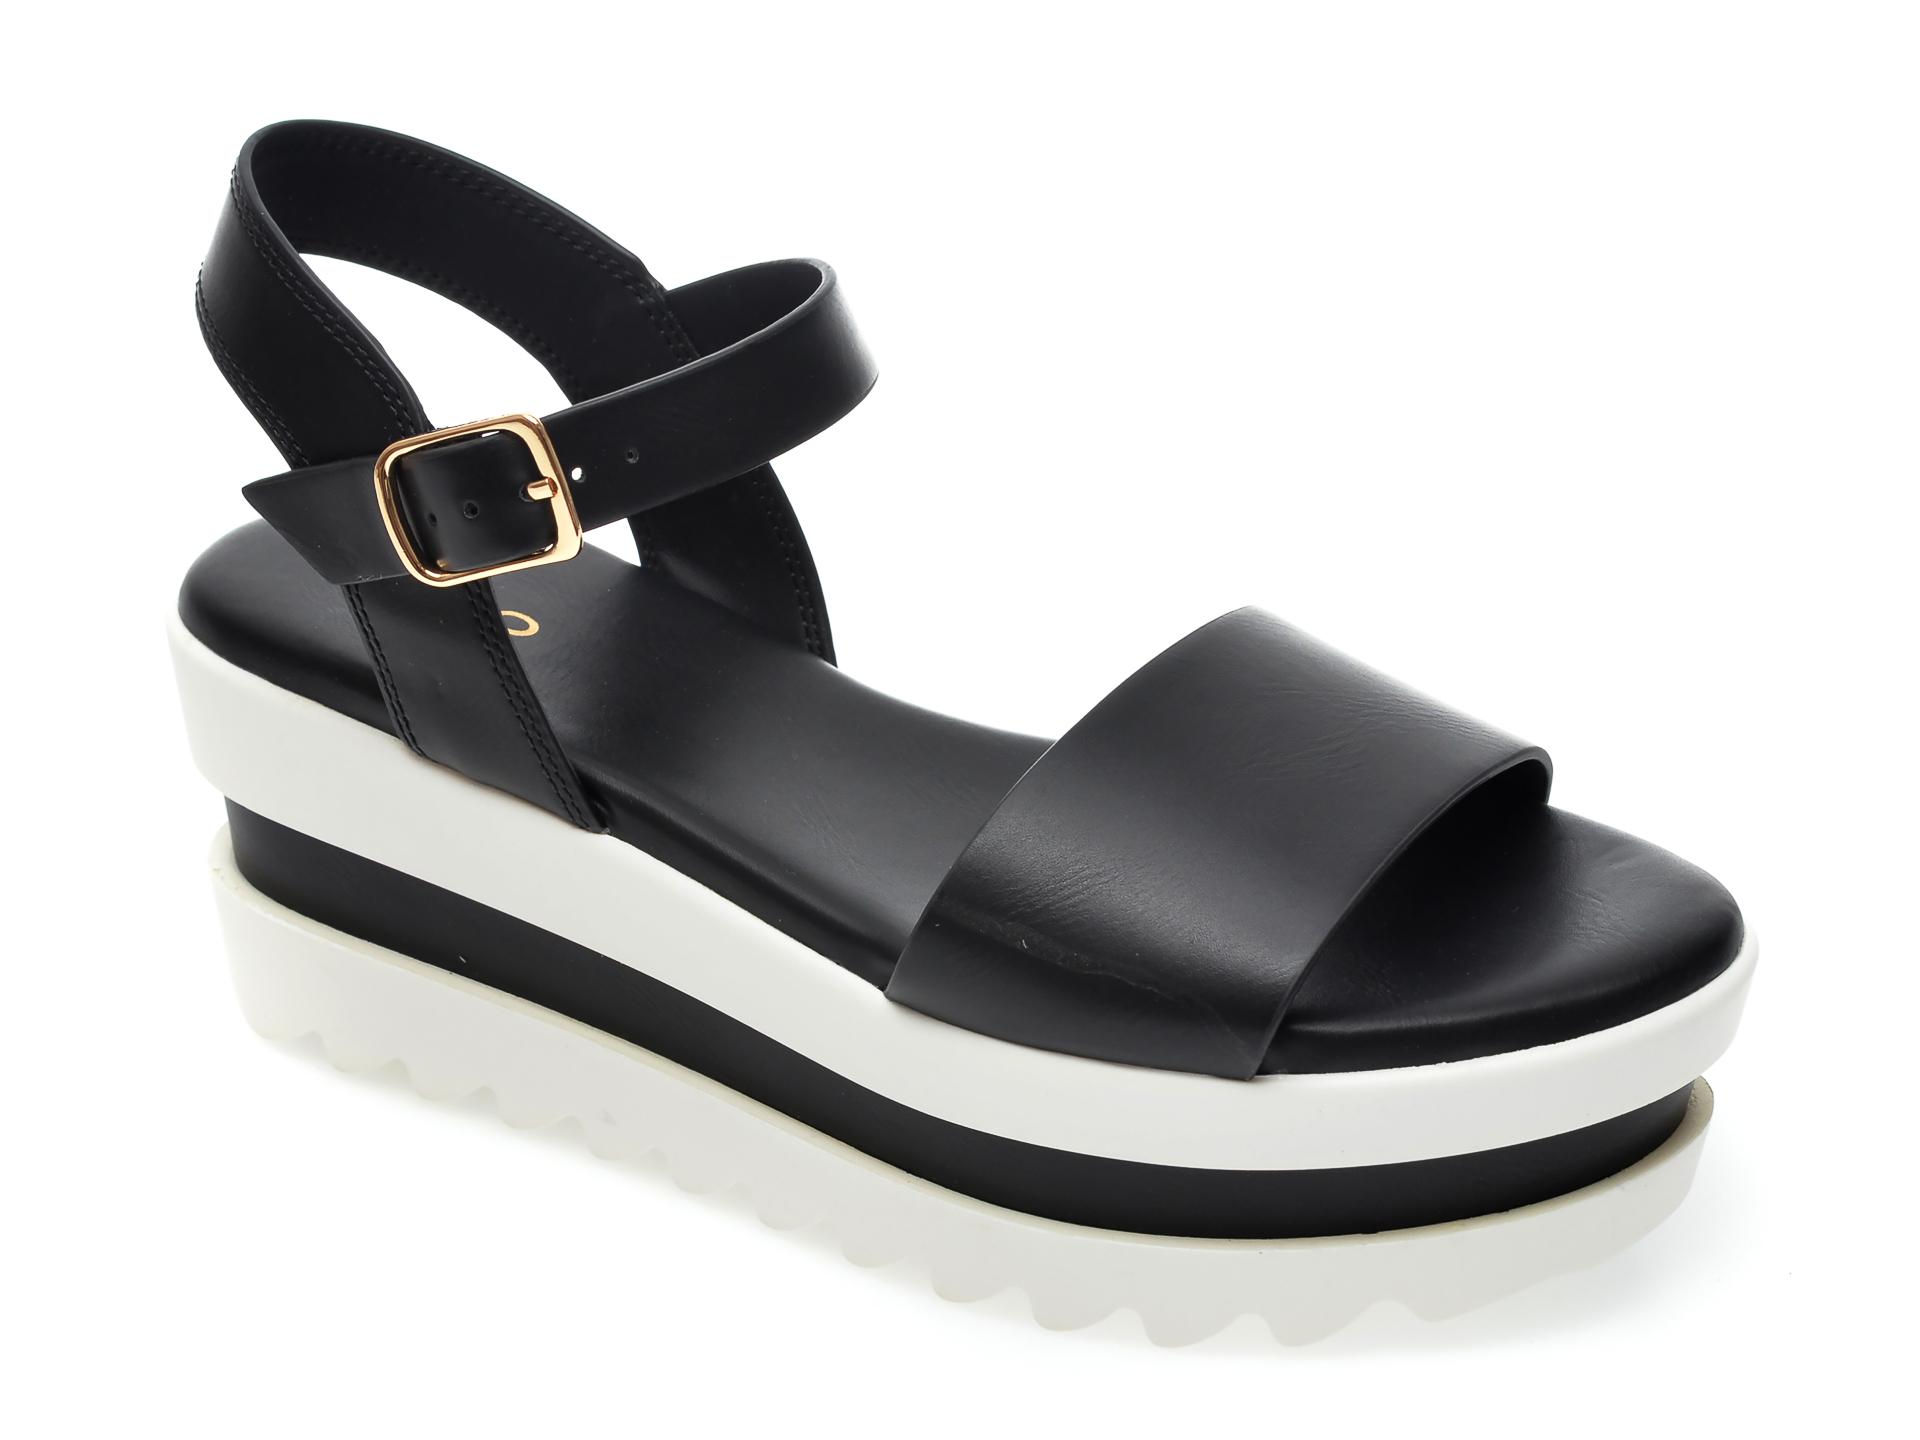 Sandale ALDO negre, Thryndra001, din piele ecologica imagine otter.ro